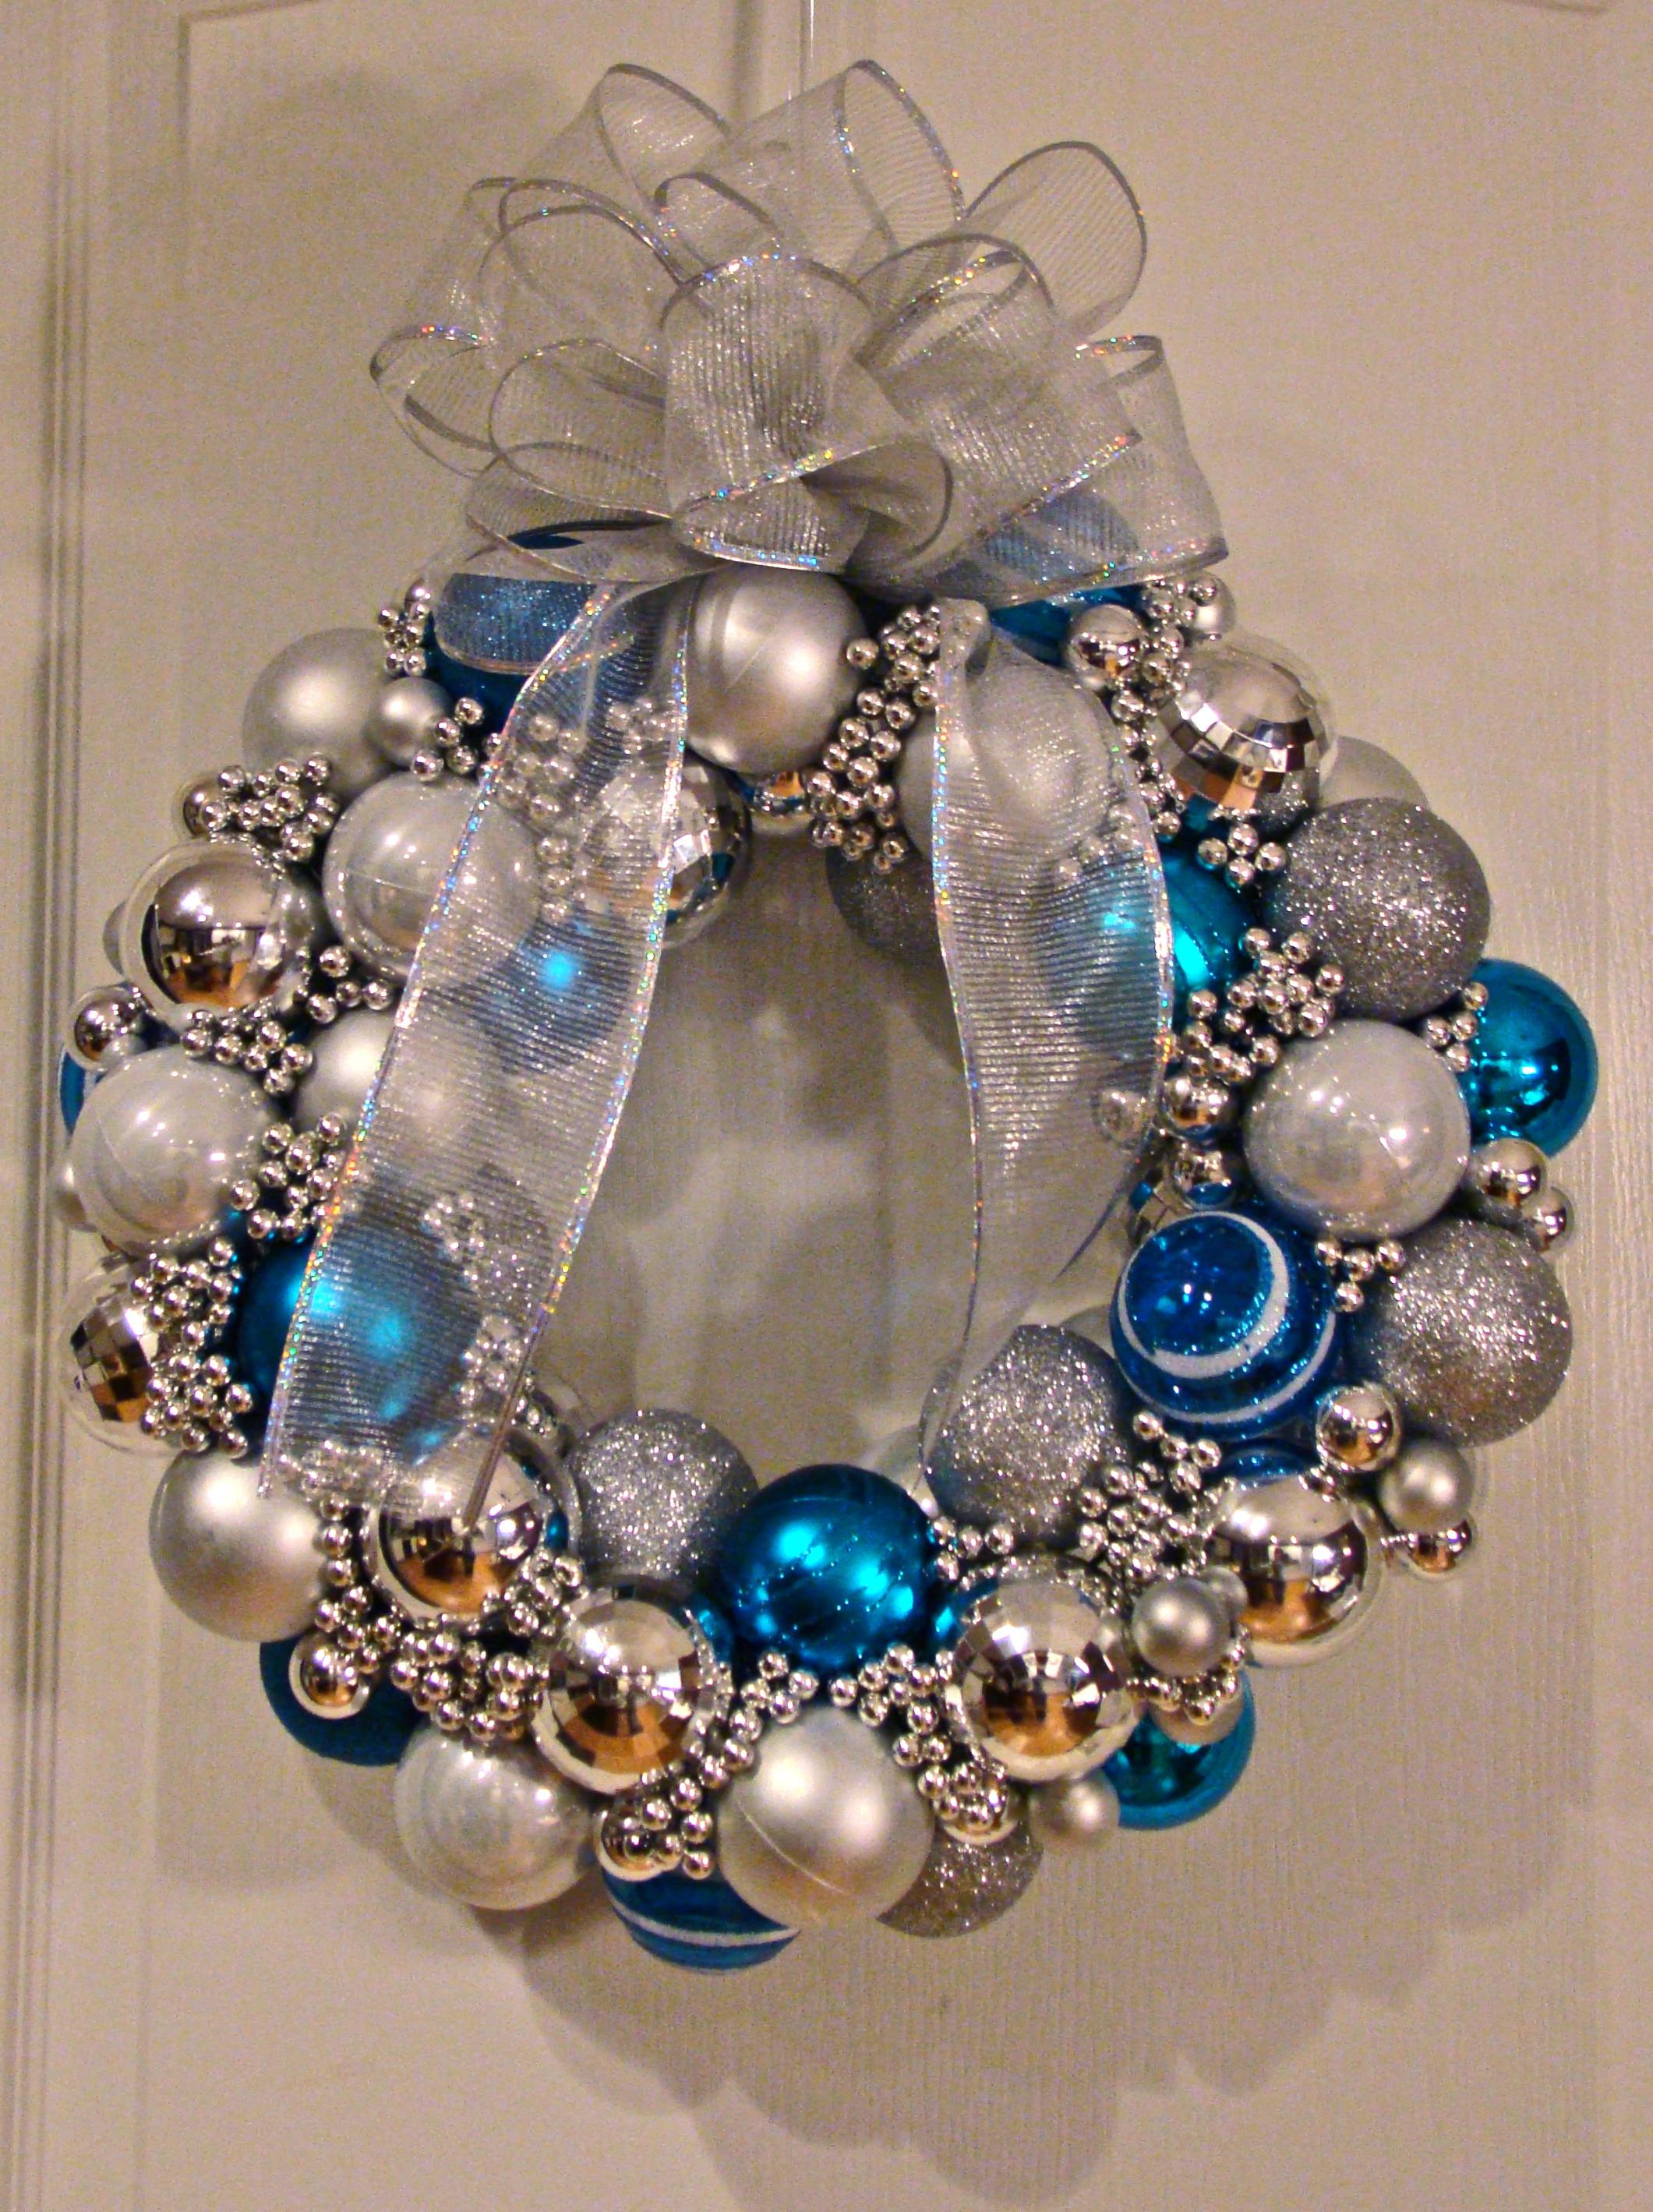 Christmas Ball Wreath DIY  Christmas Ball Wreath…TUTORIAL Cyndicated